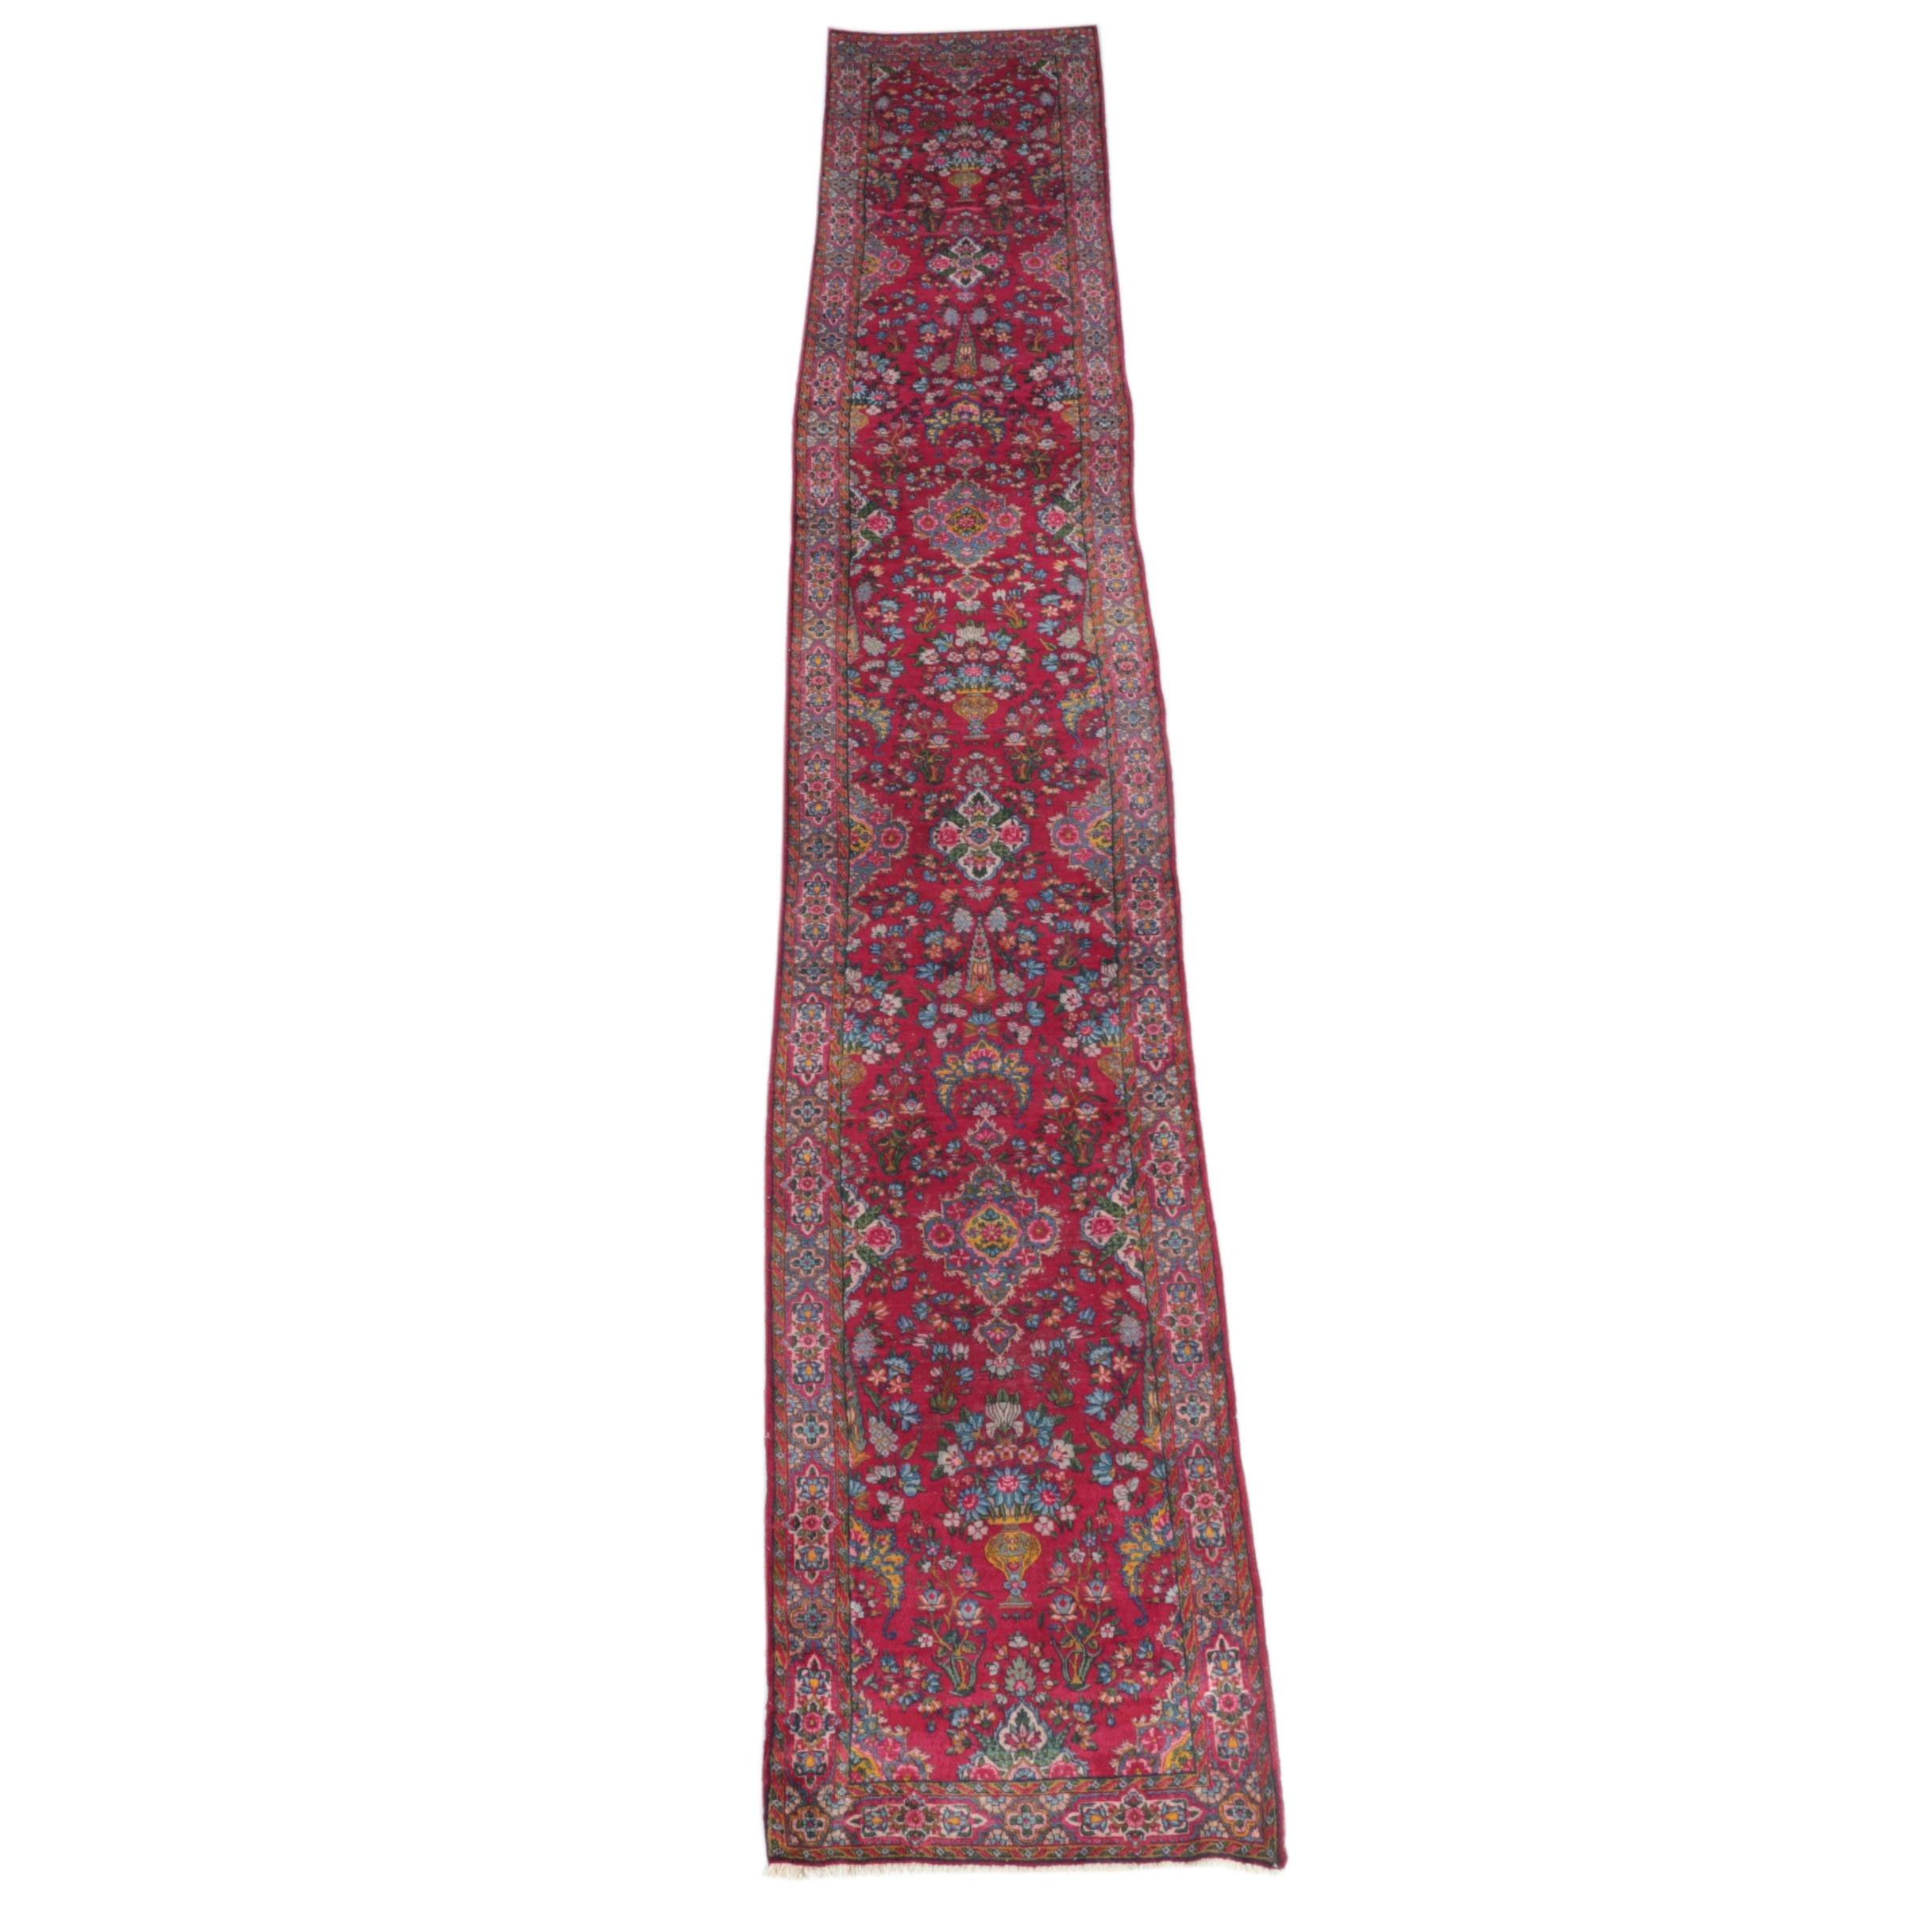 Hand-Knotted Persian Kerman Carpet Runner